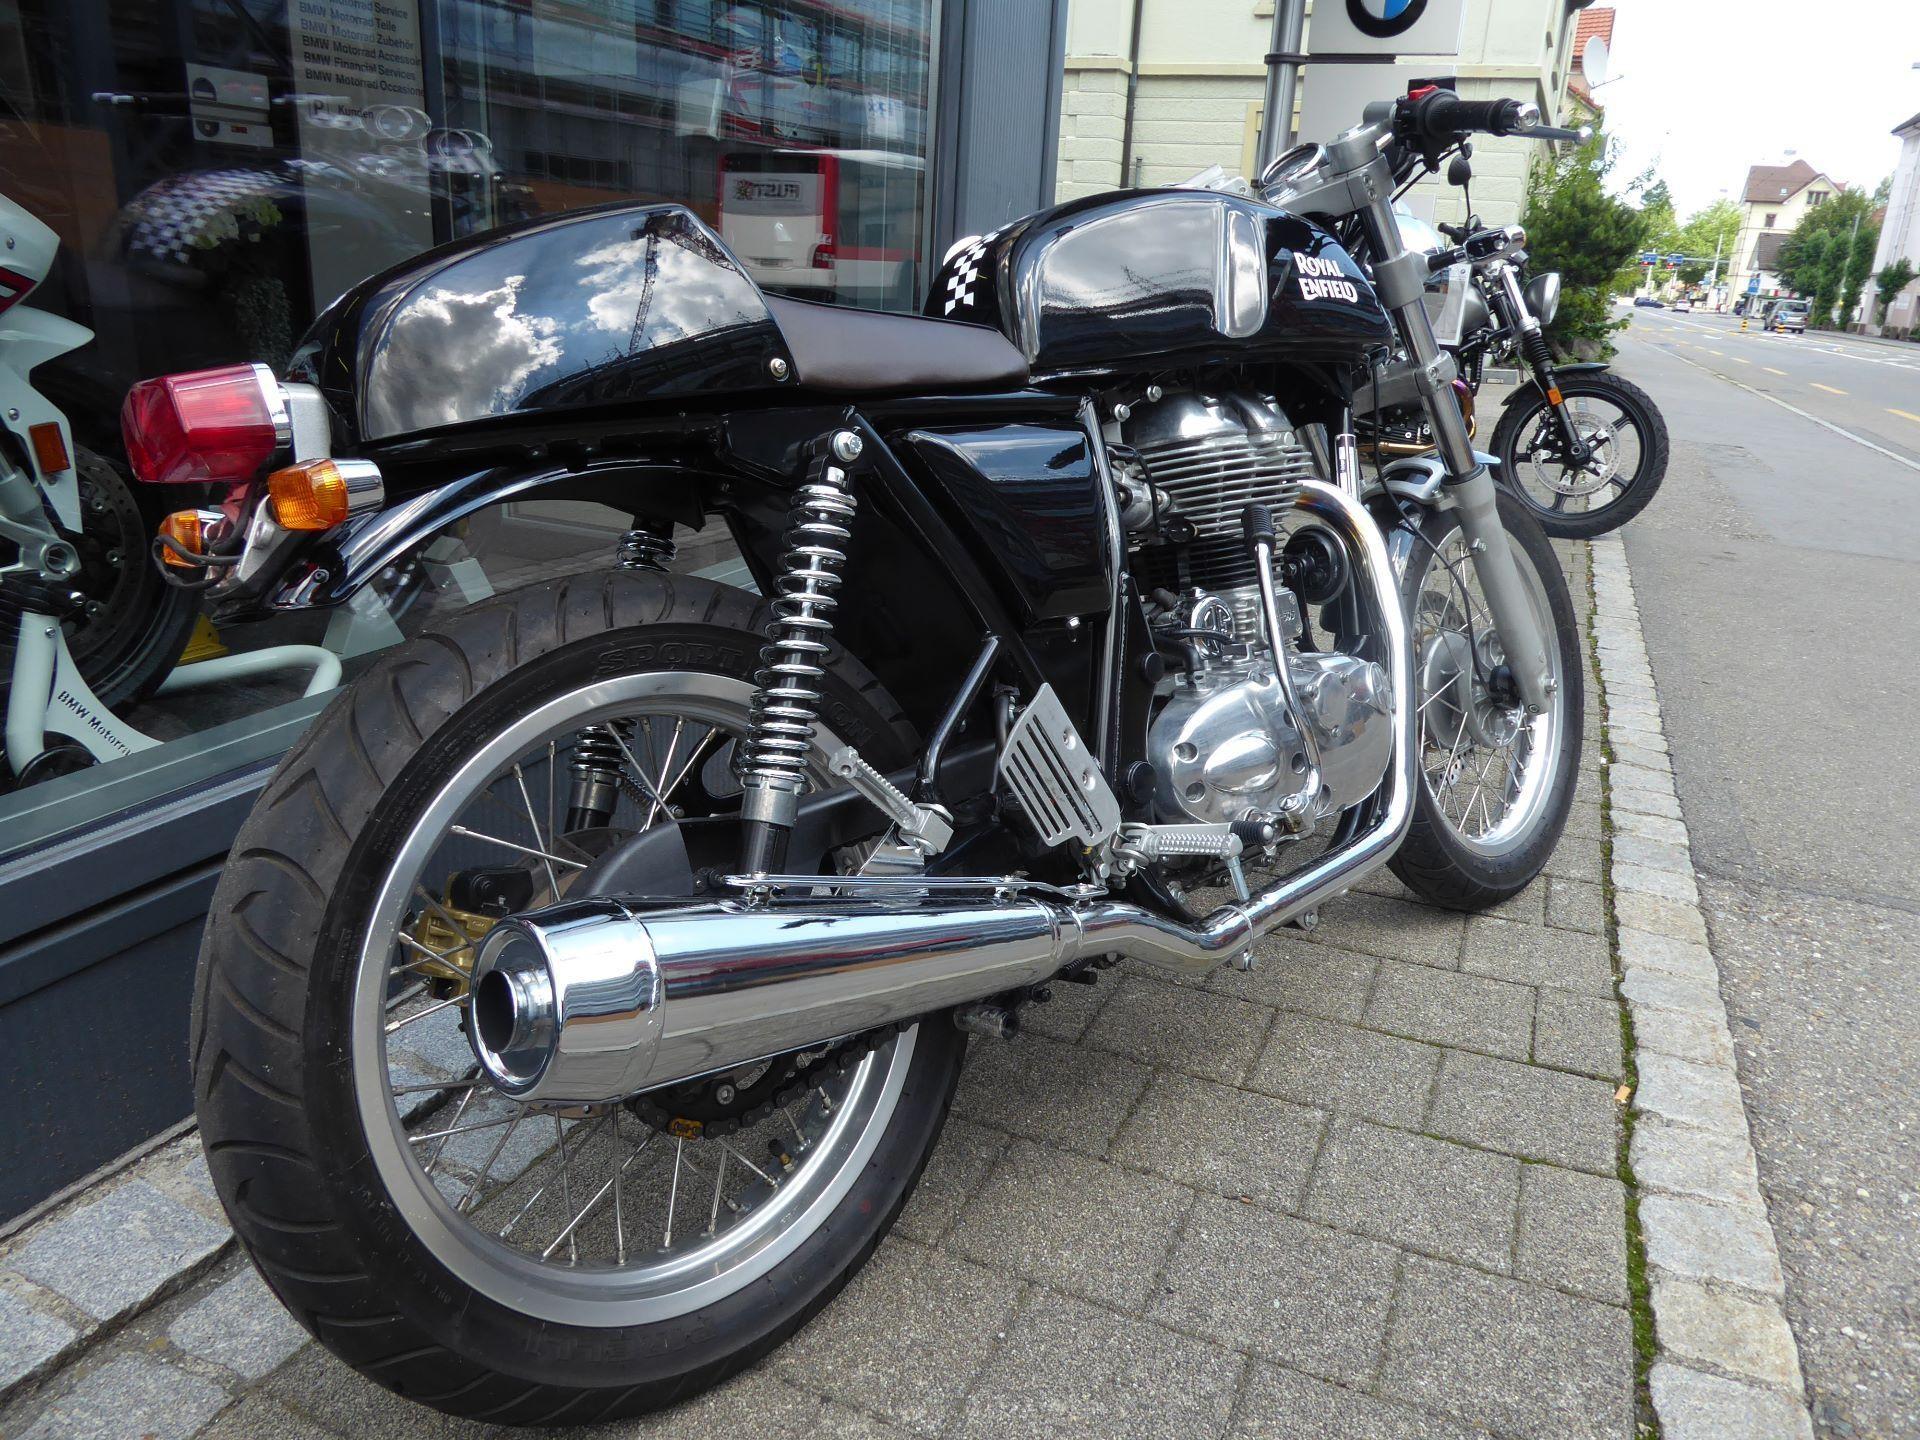 moto occasions acheter royal enfield continental gt 535 ren frisch ag st gallen. Black Bedroom Furniture Sets. Home Design Ideas